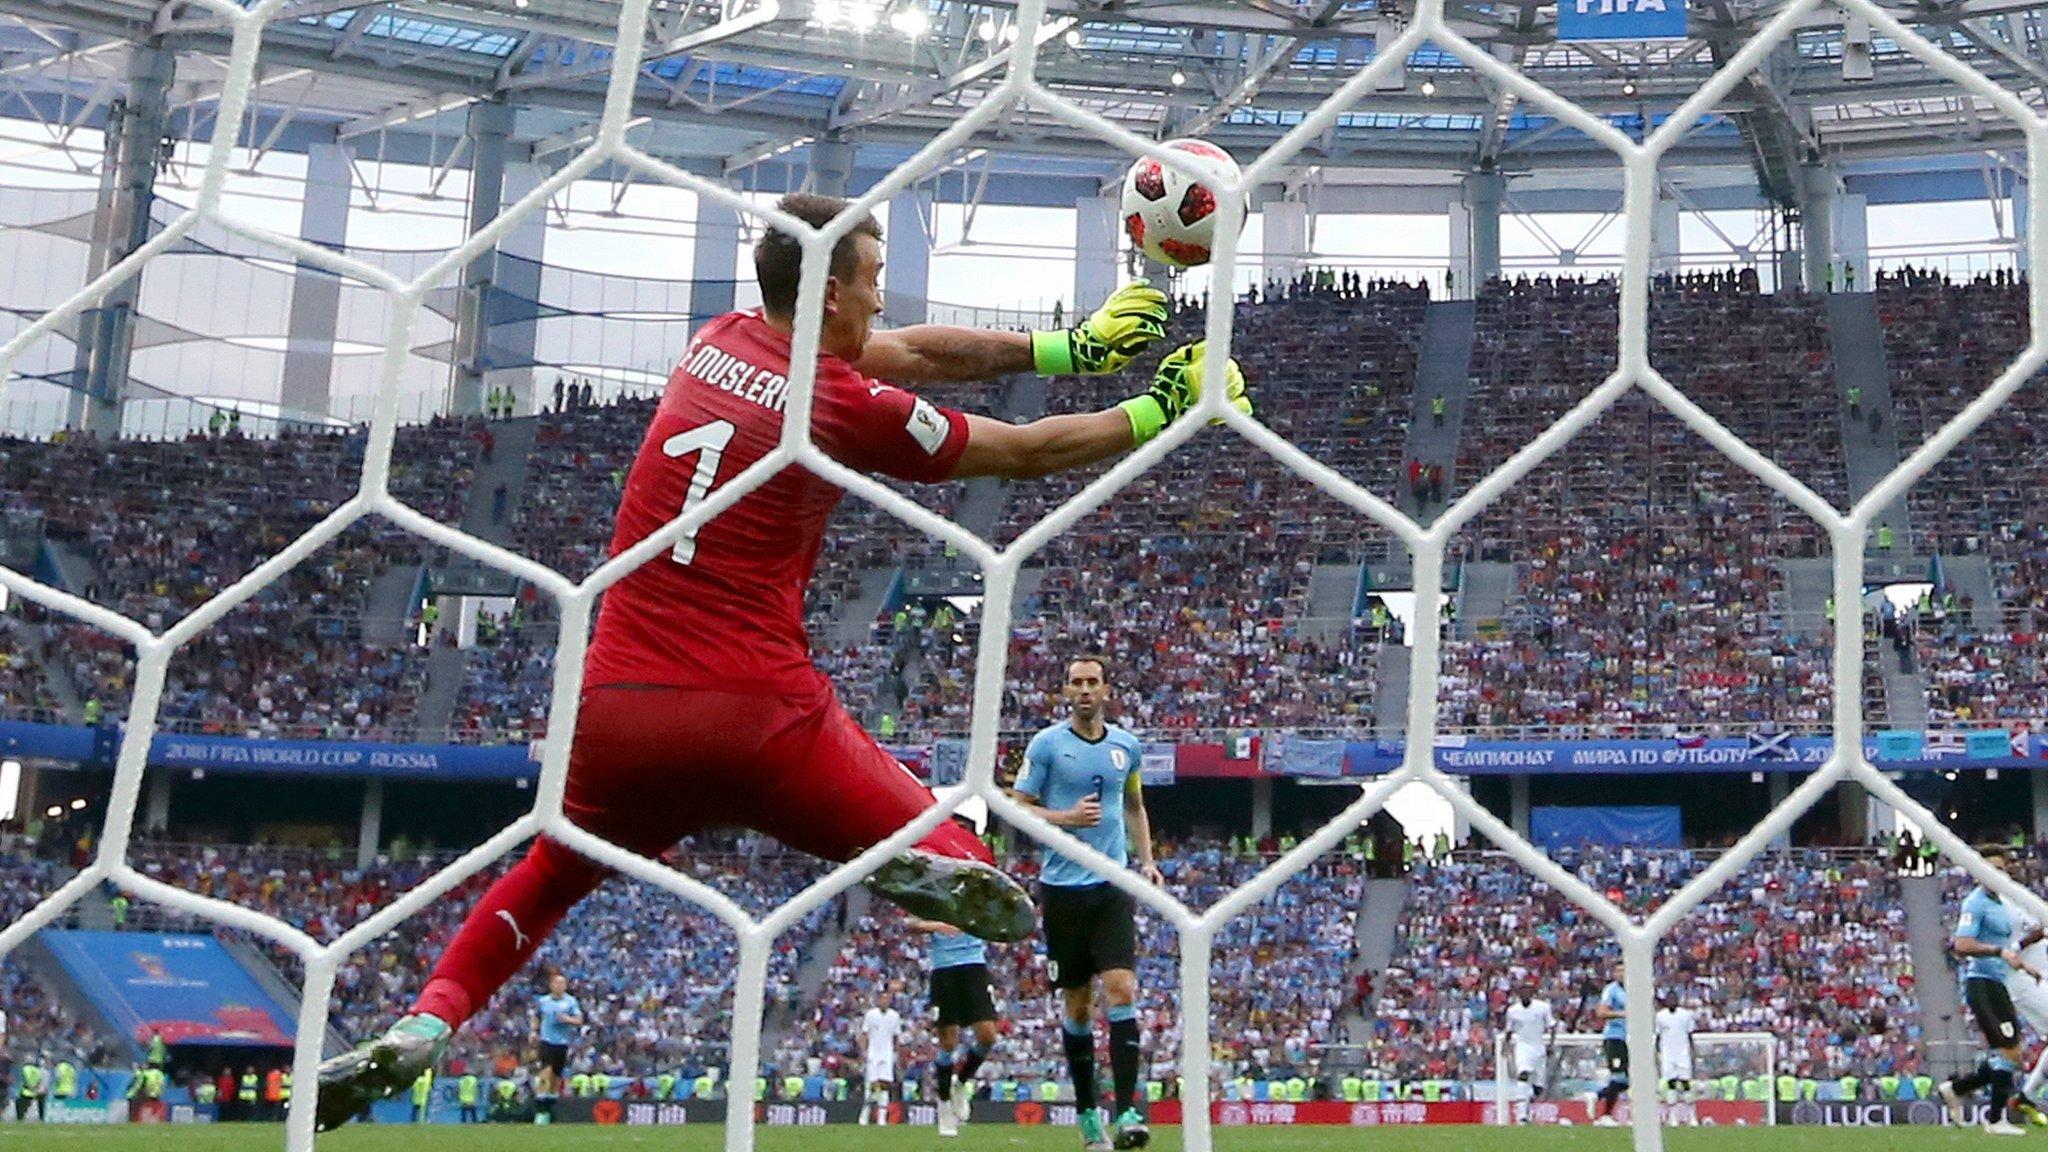 World Cup 2018: France go 2-0 up as Antoine Griezmann strike slips through hands of Uruguay's Fernando Muslera